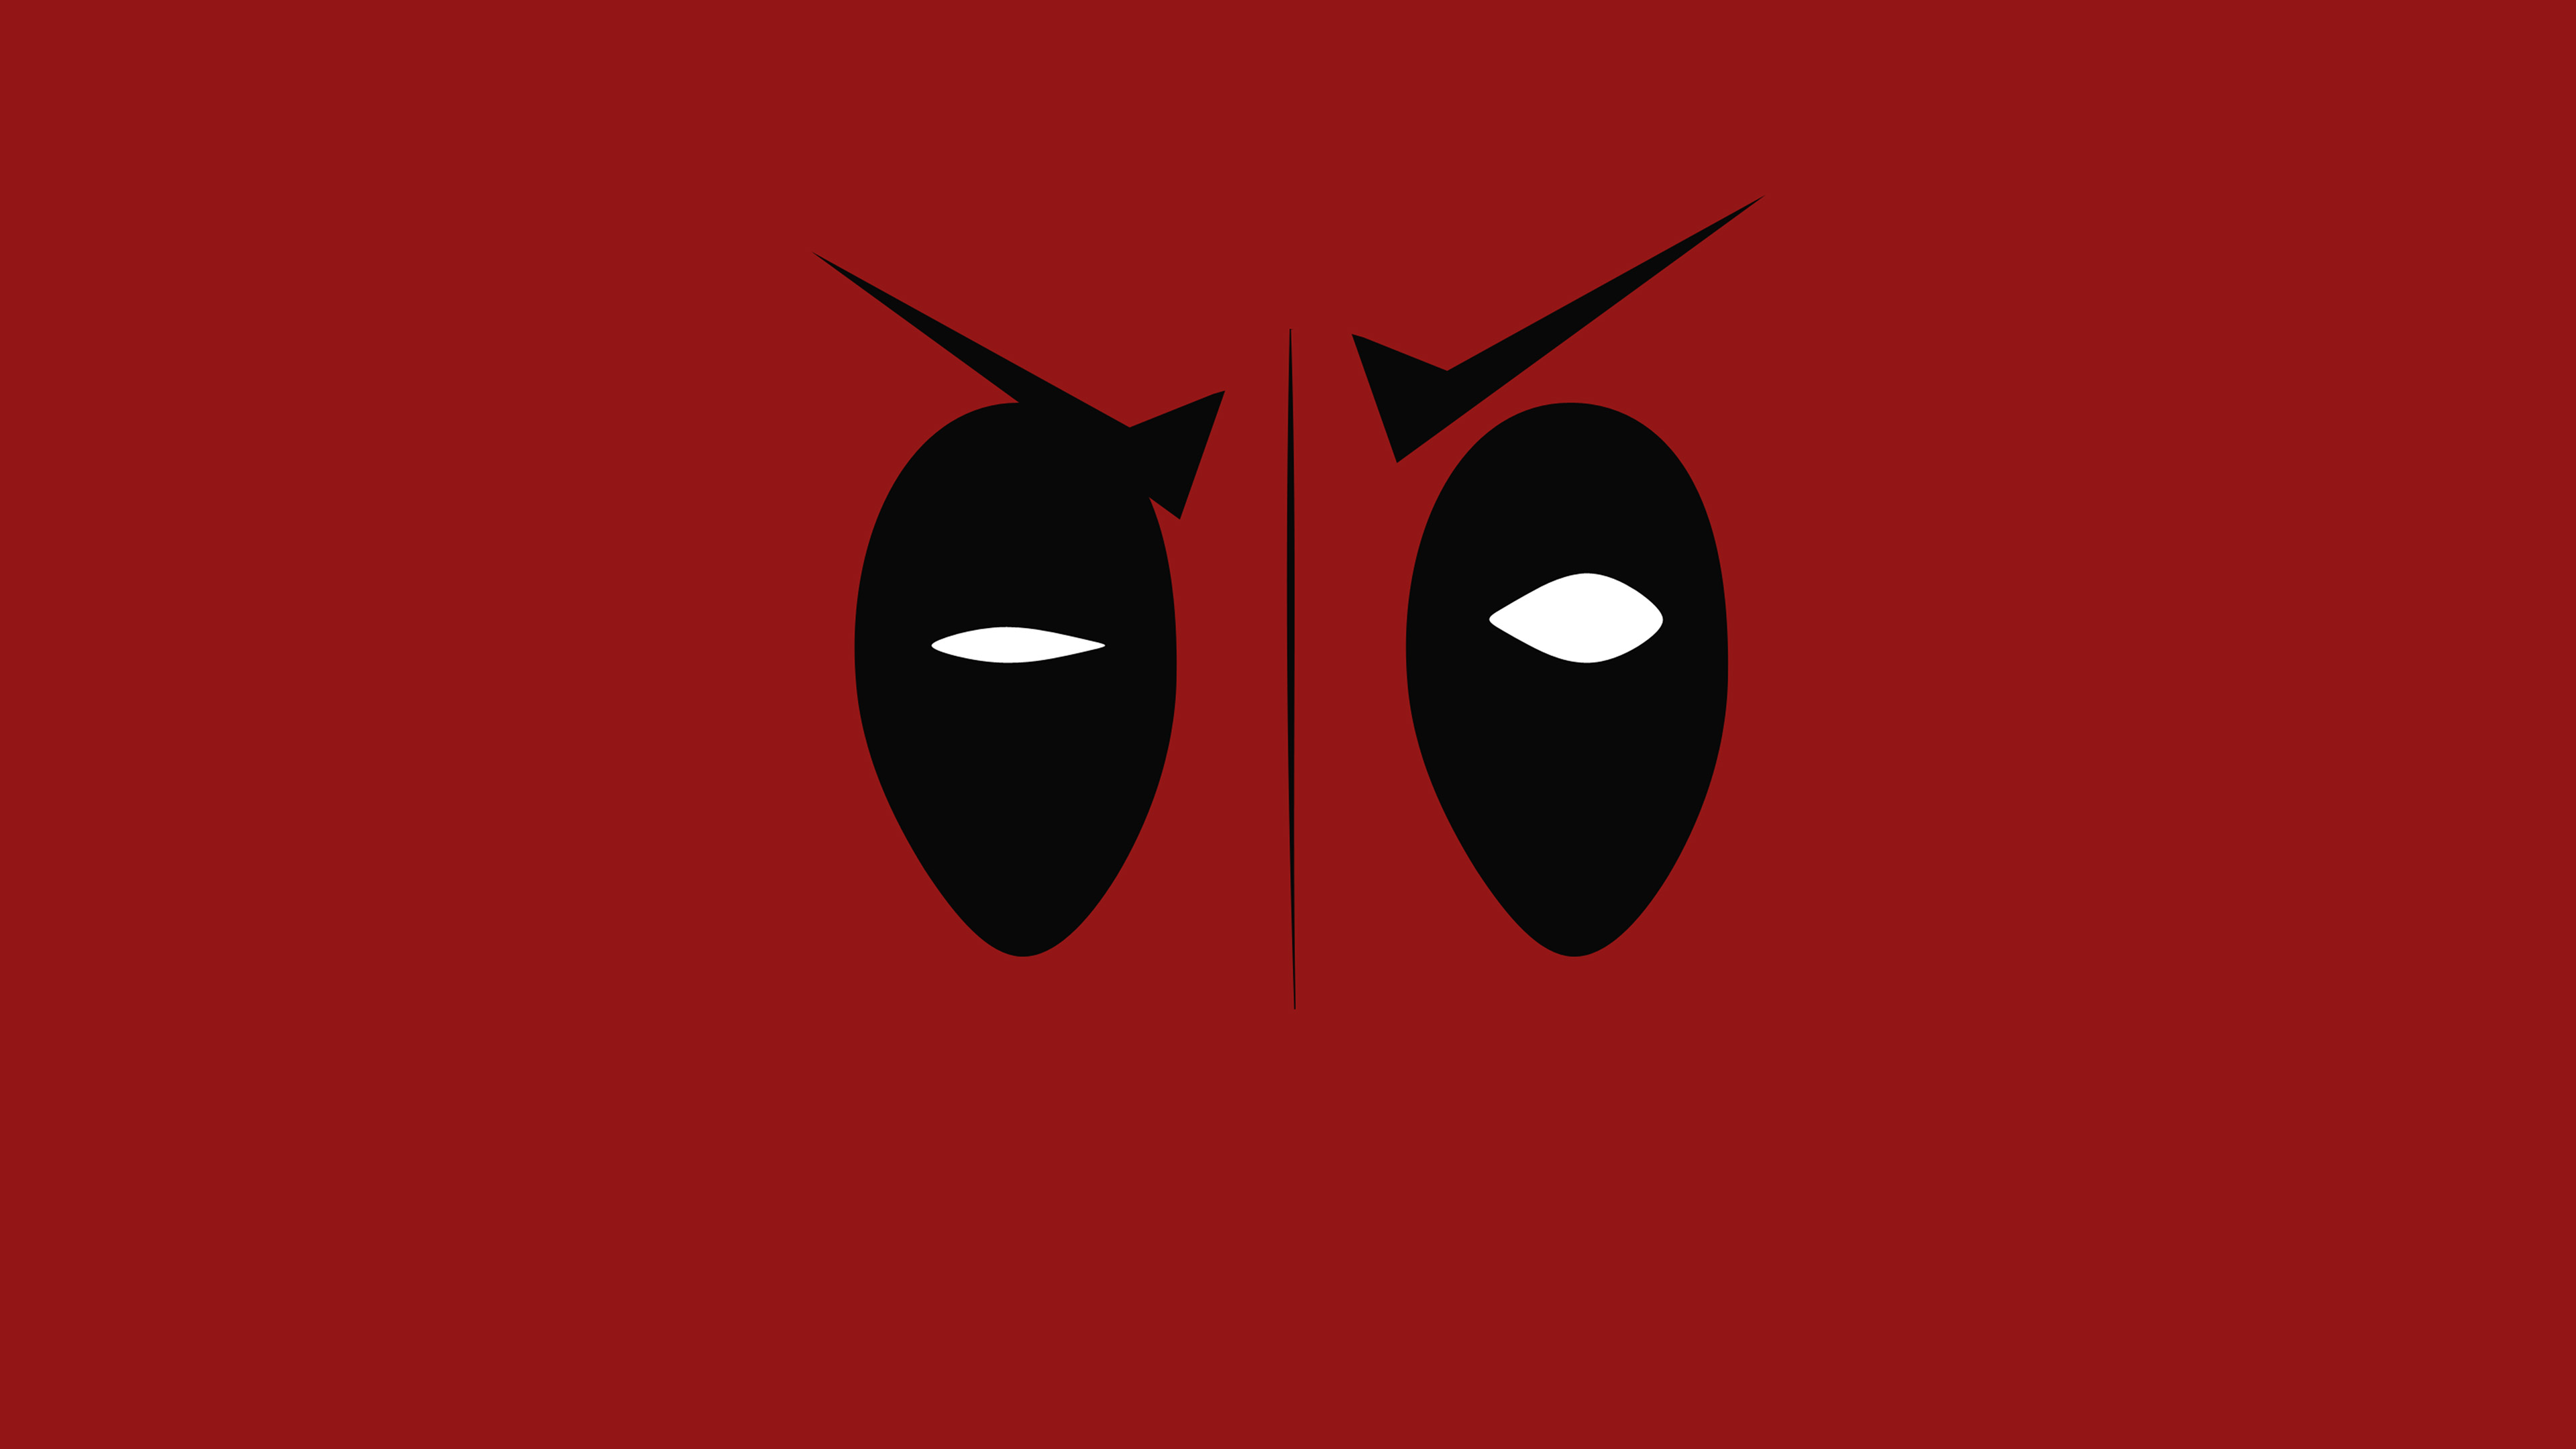 Iphone 7 Plus Christmas Wallpaper Ap59 Deadpool Hero Eye Logo Art Film Wallpaper